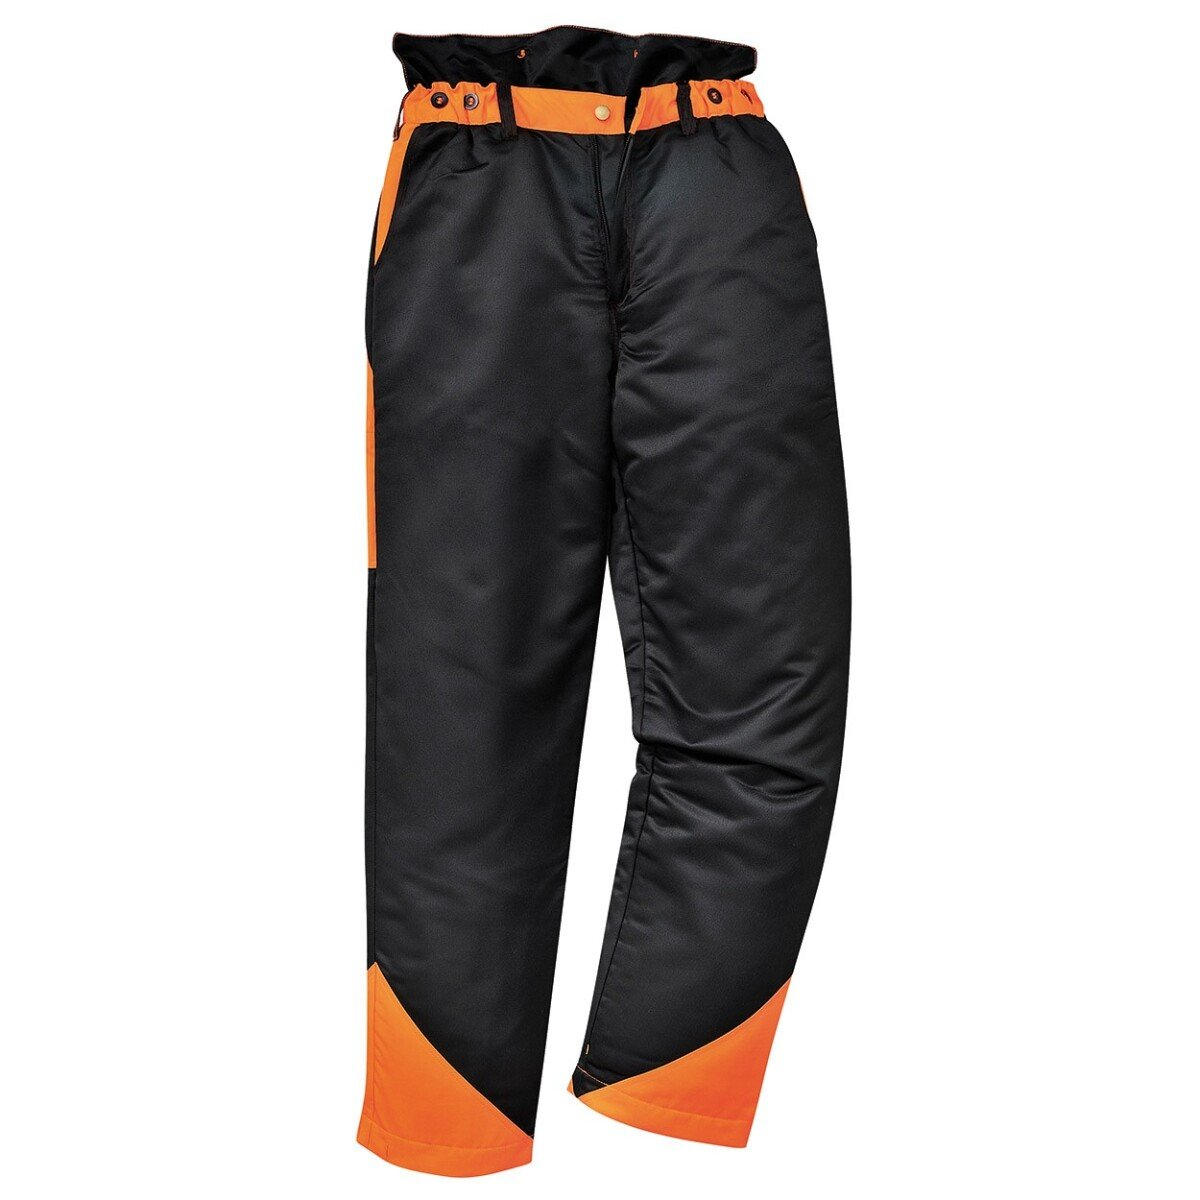 Portwest CH11 Oak Chainsaw Trousers Black/Orange